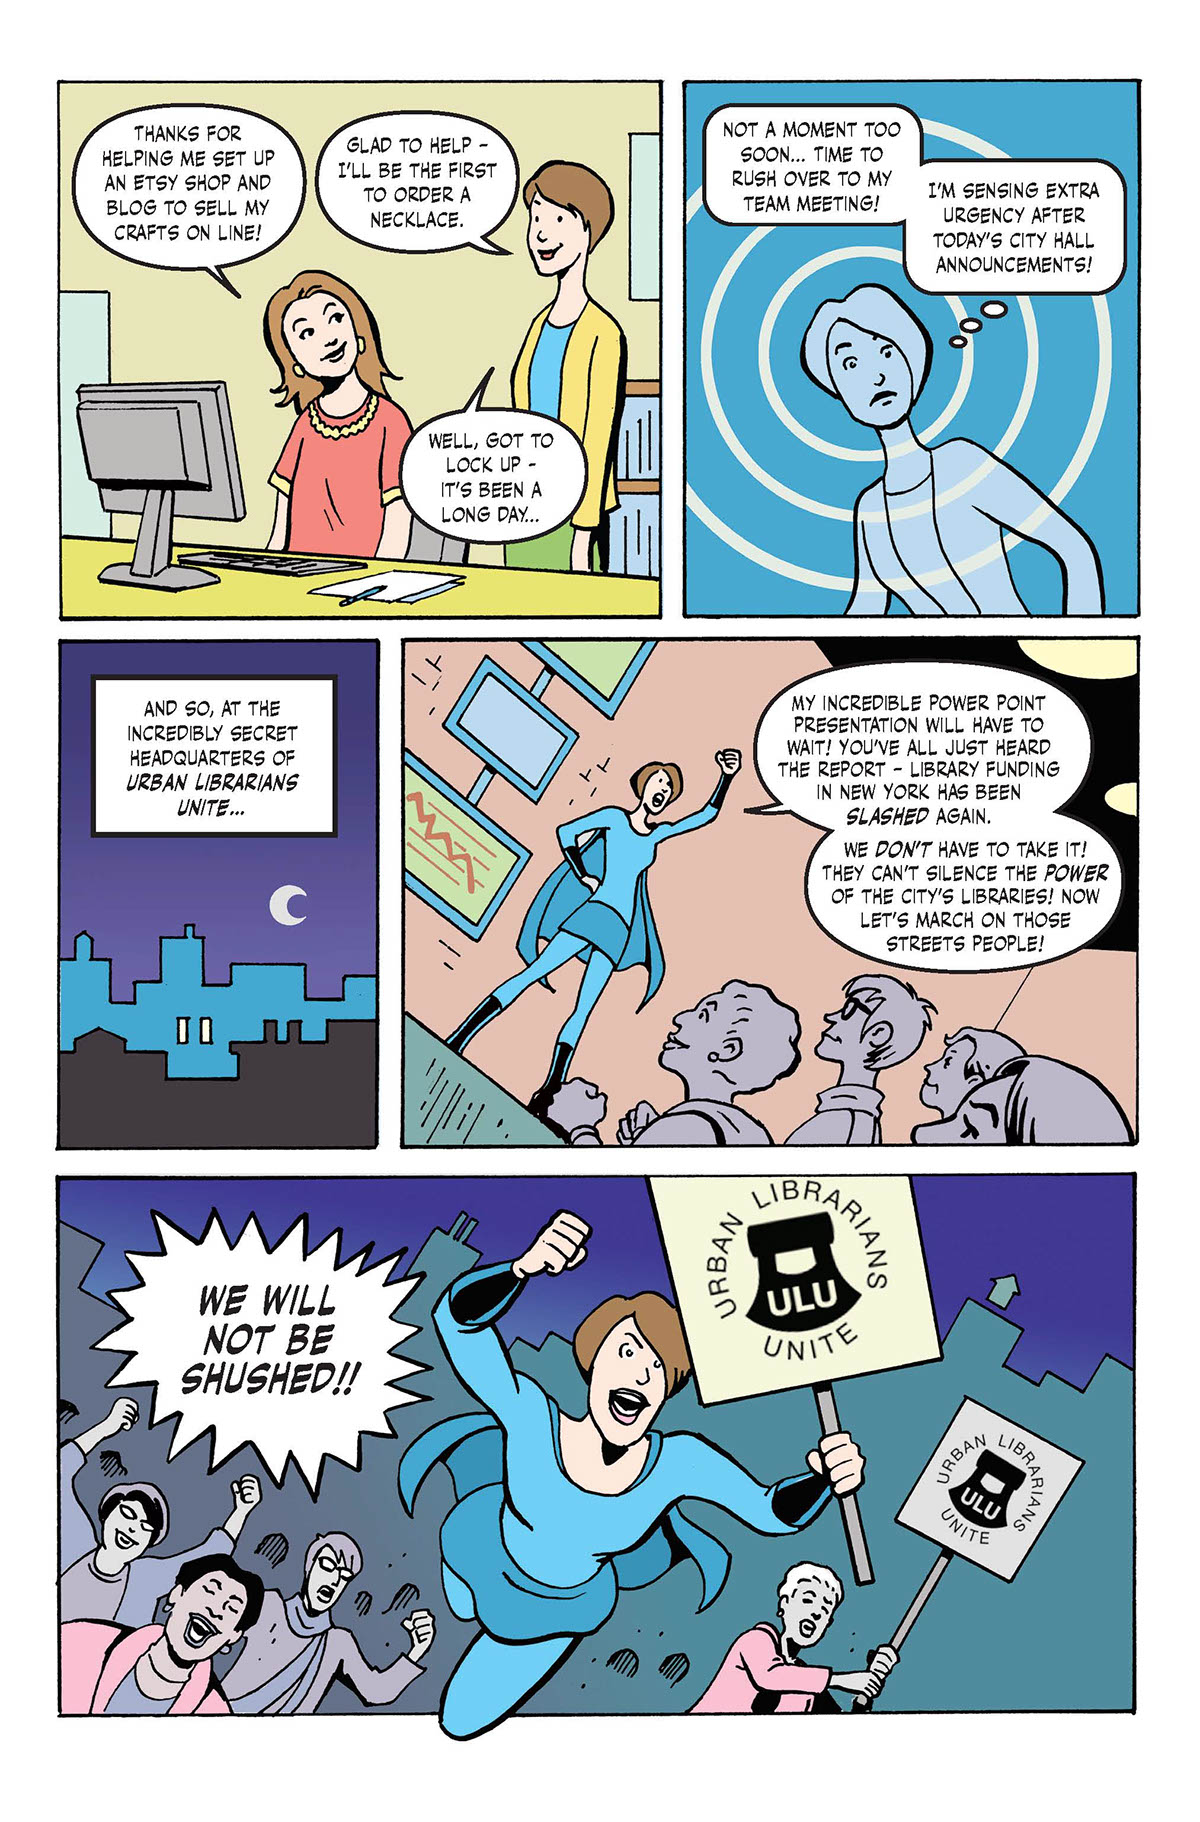 LibrarianSuperhero-4.jpg